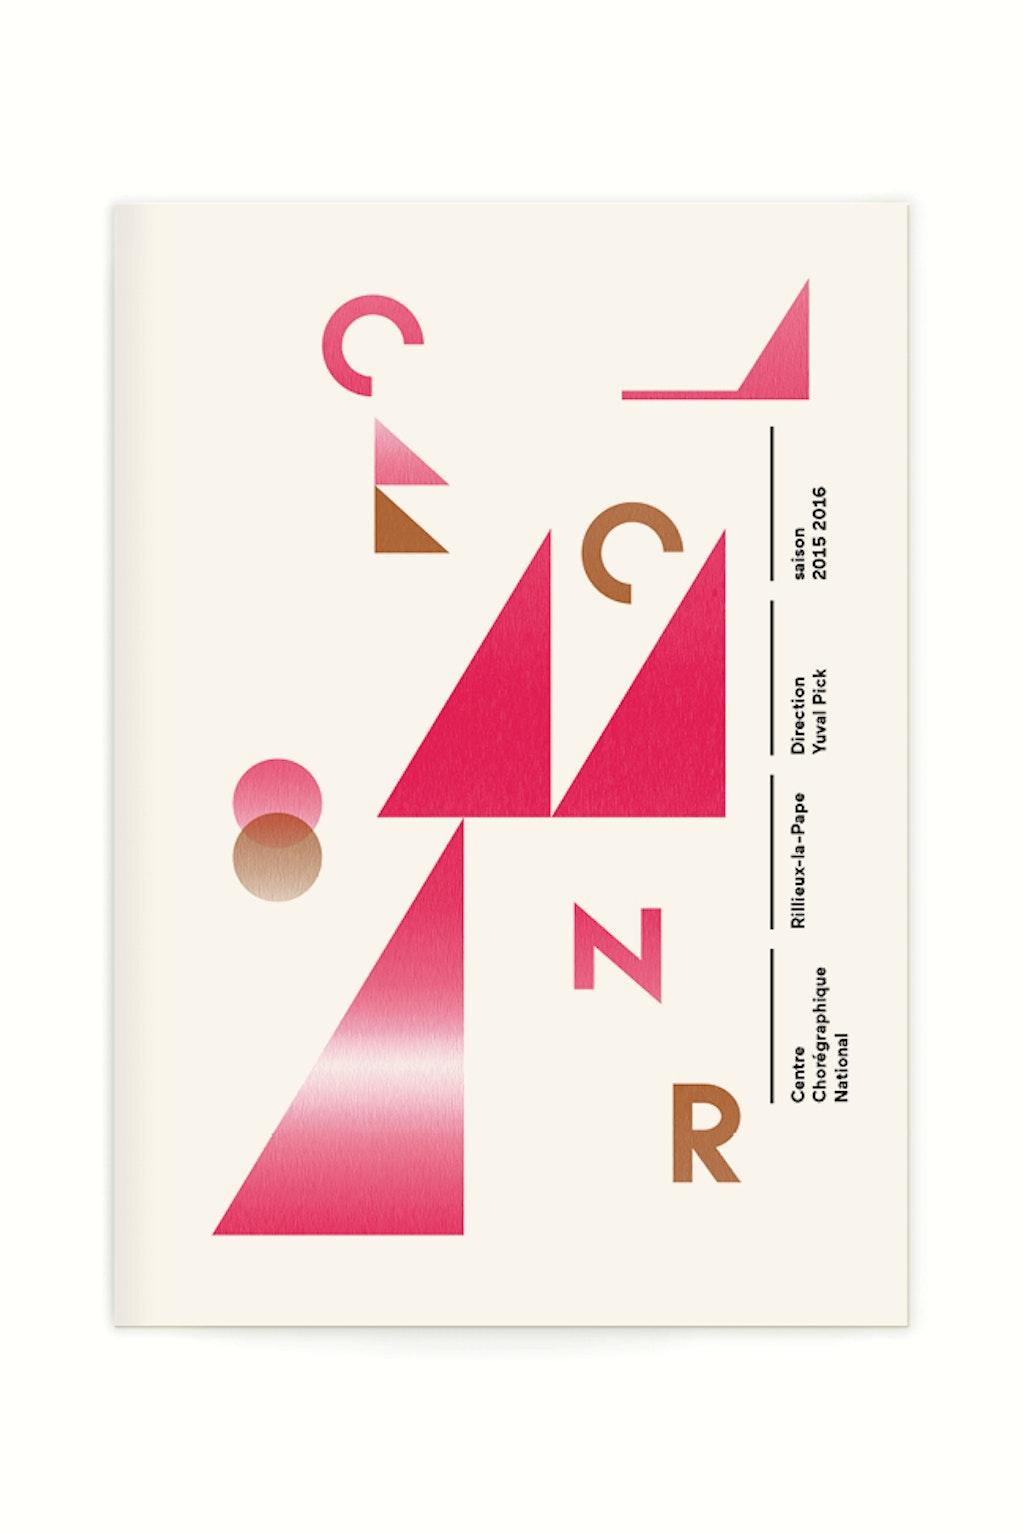 CCNR 15+16